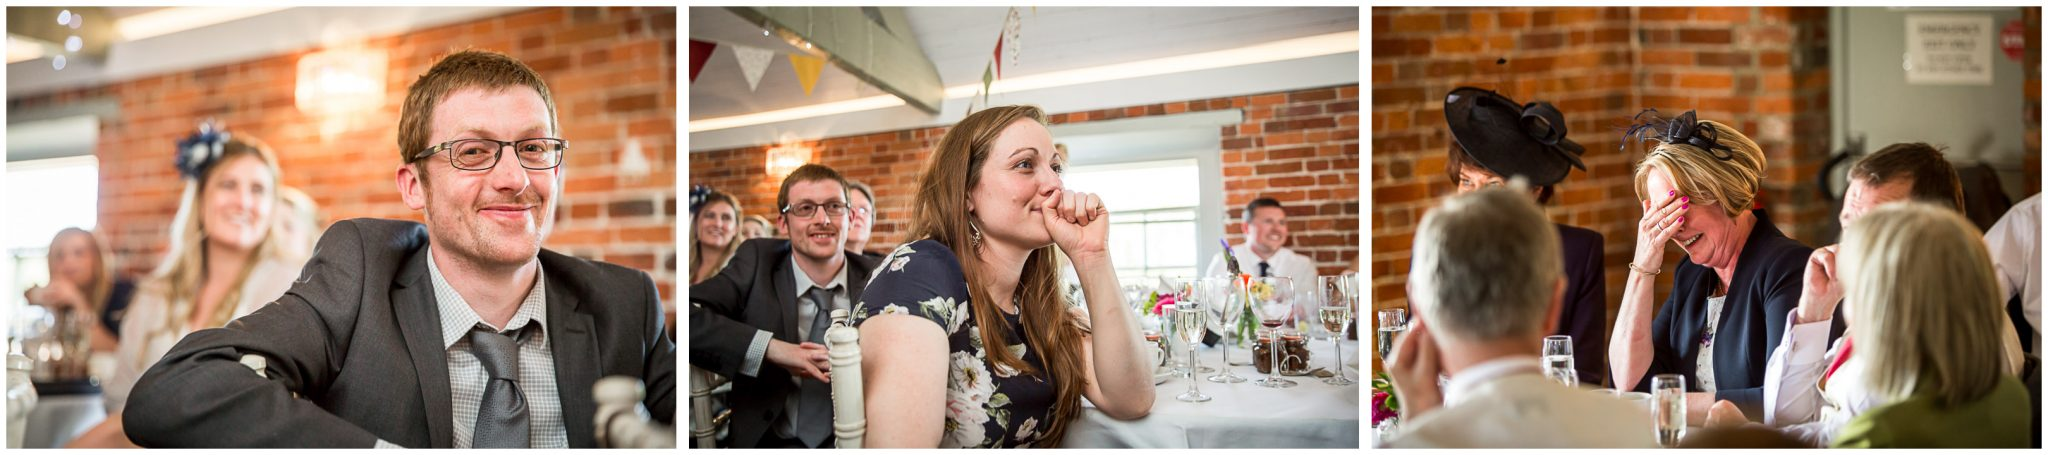 Sopley wedding photographer speeches